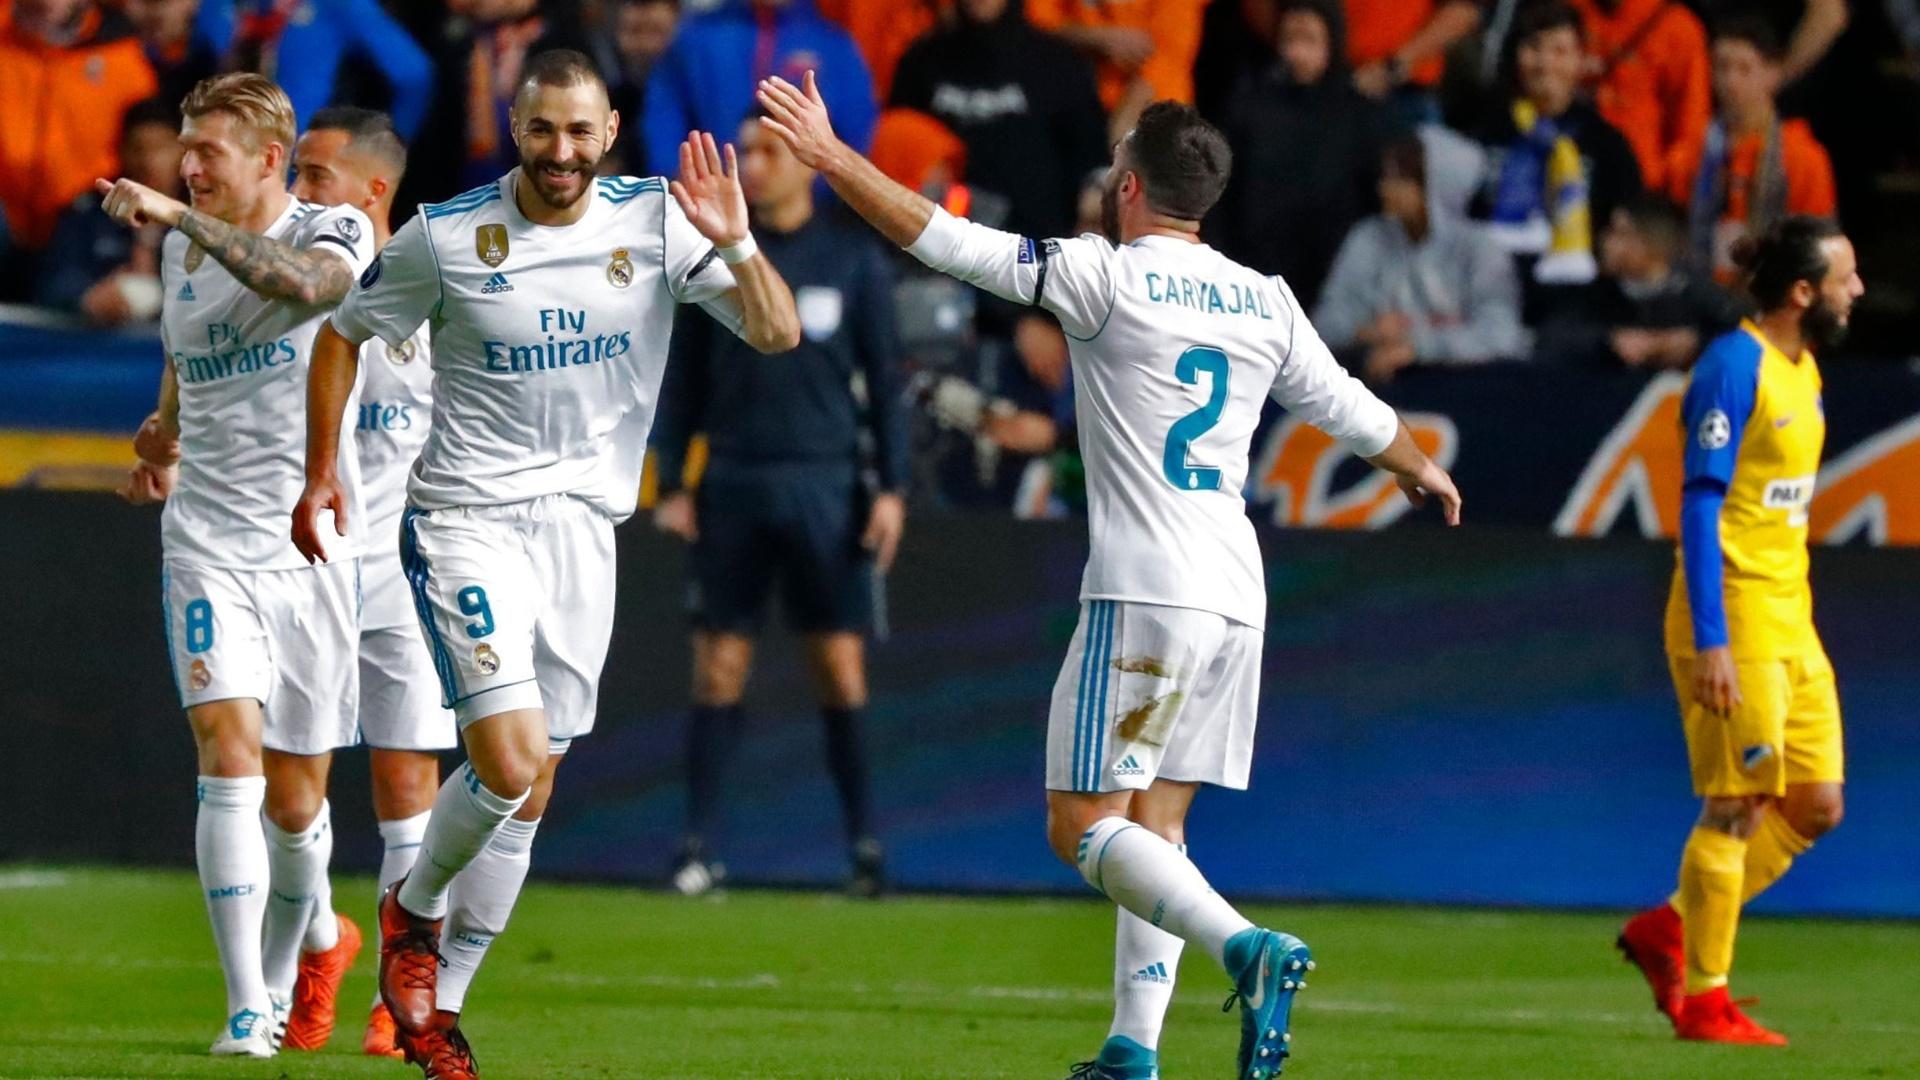 Benzema comemora gol do Real Madrid contra o Apoel